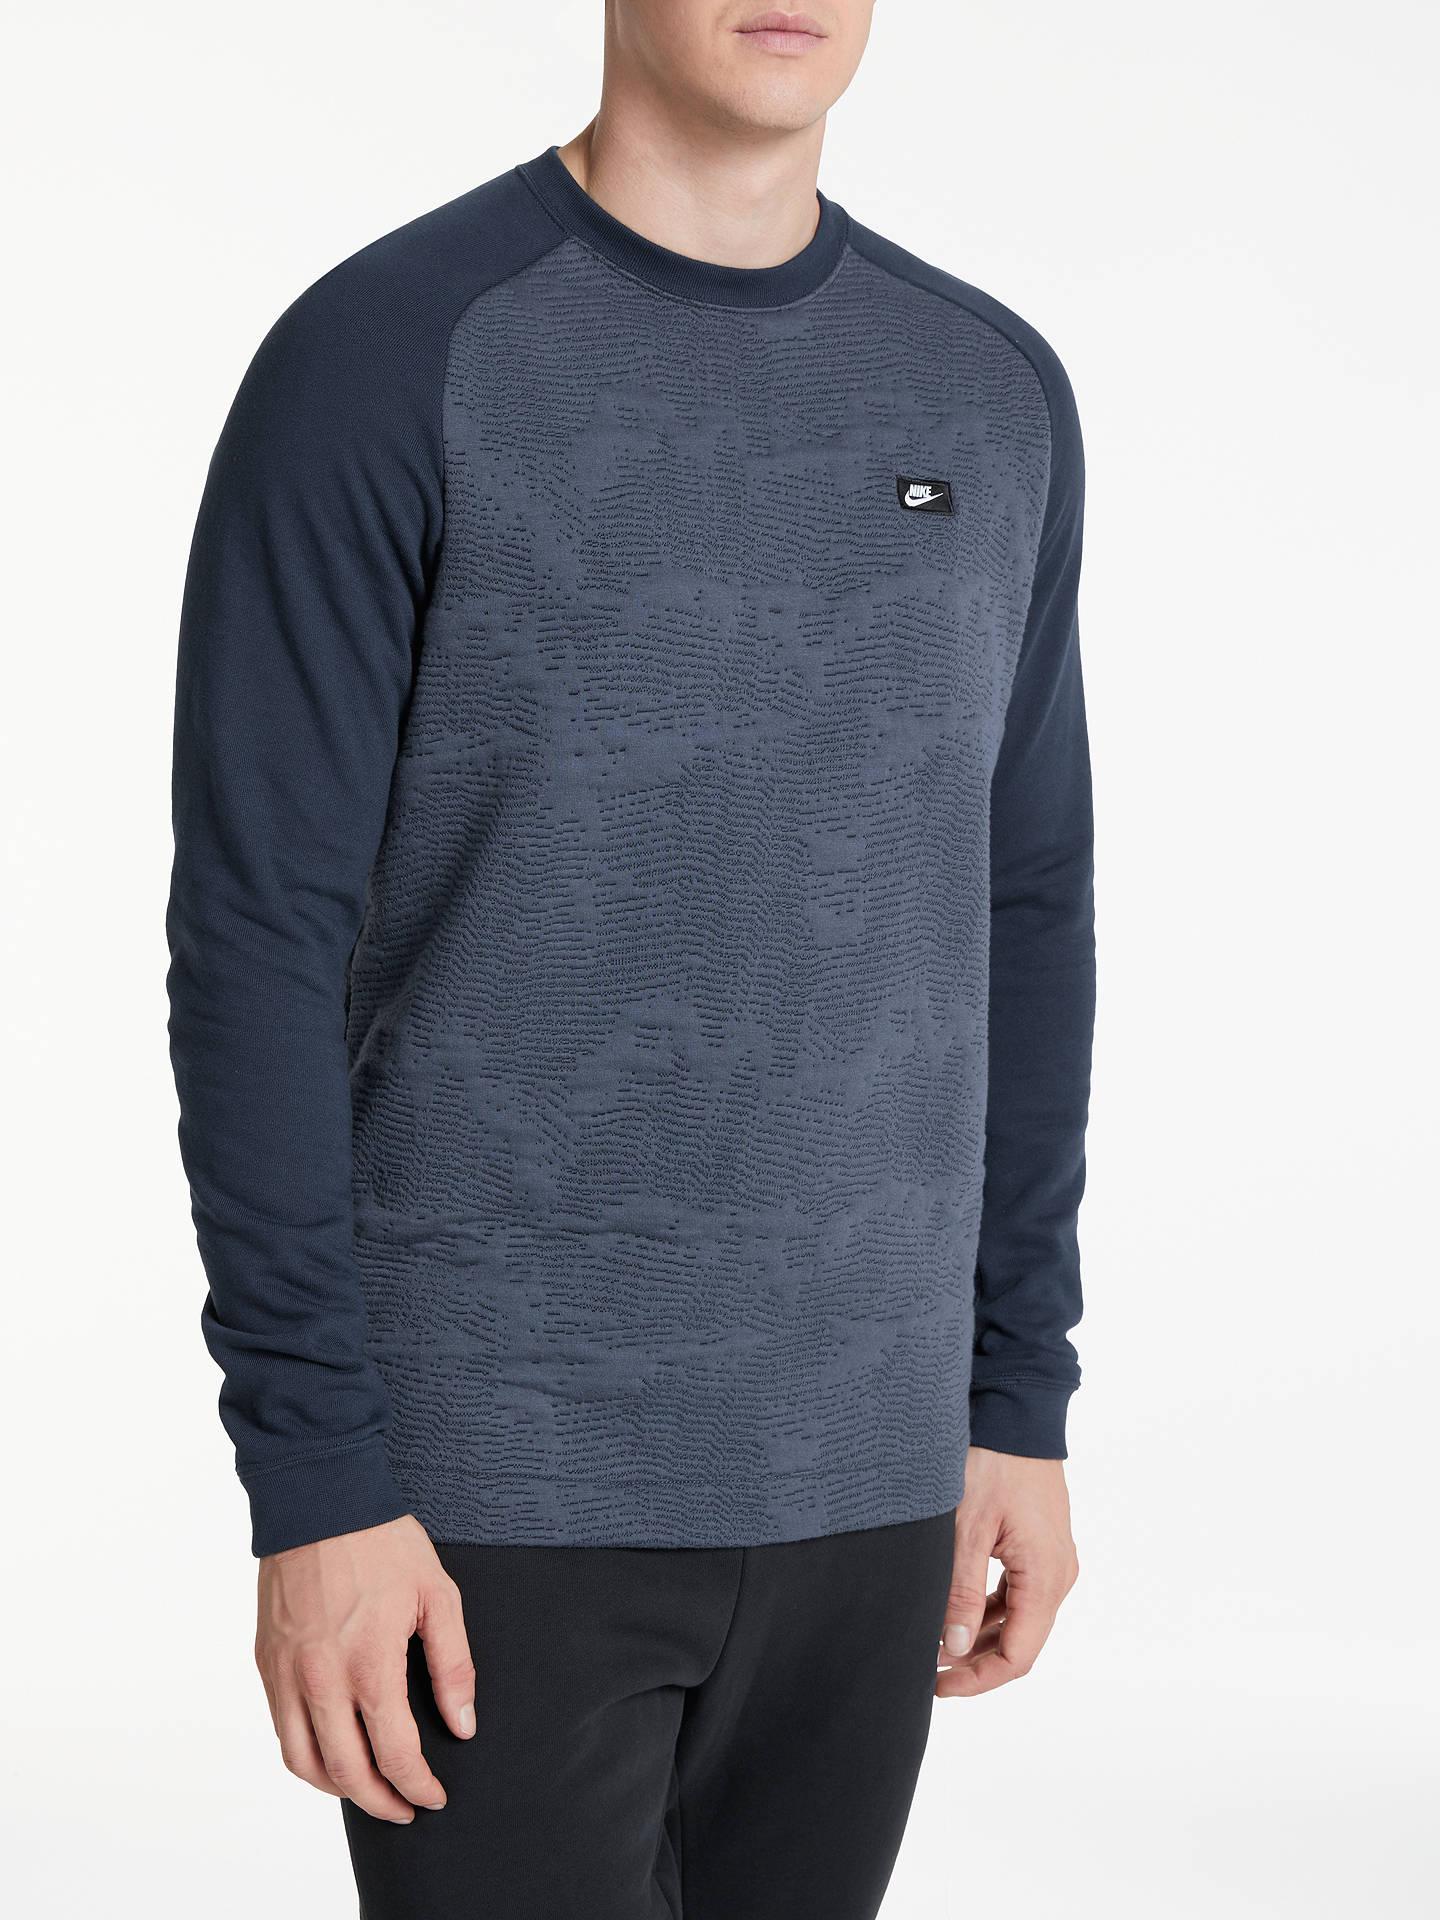 4b755d529a7c Buy Nike Sportswear Modern Crew Sweatshirt